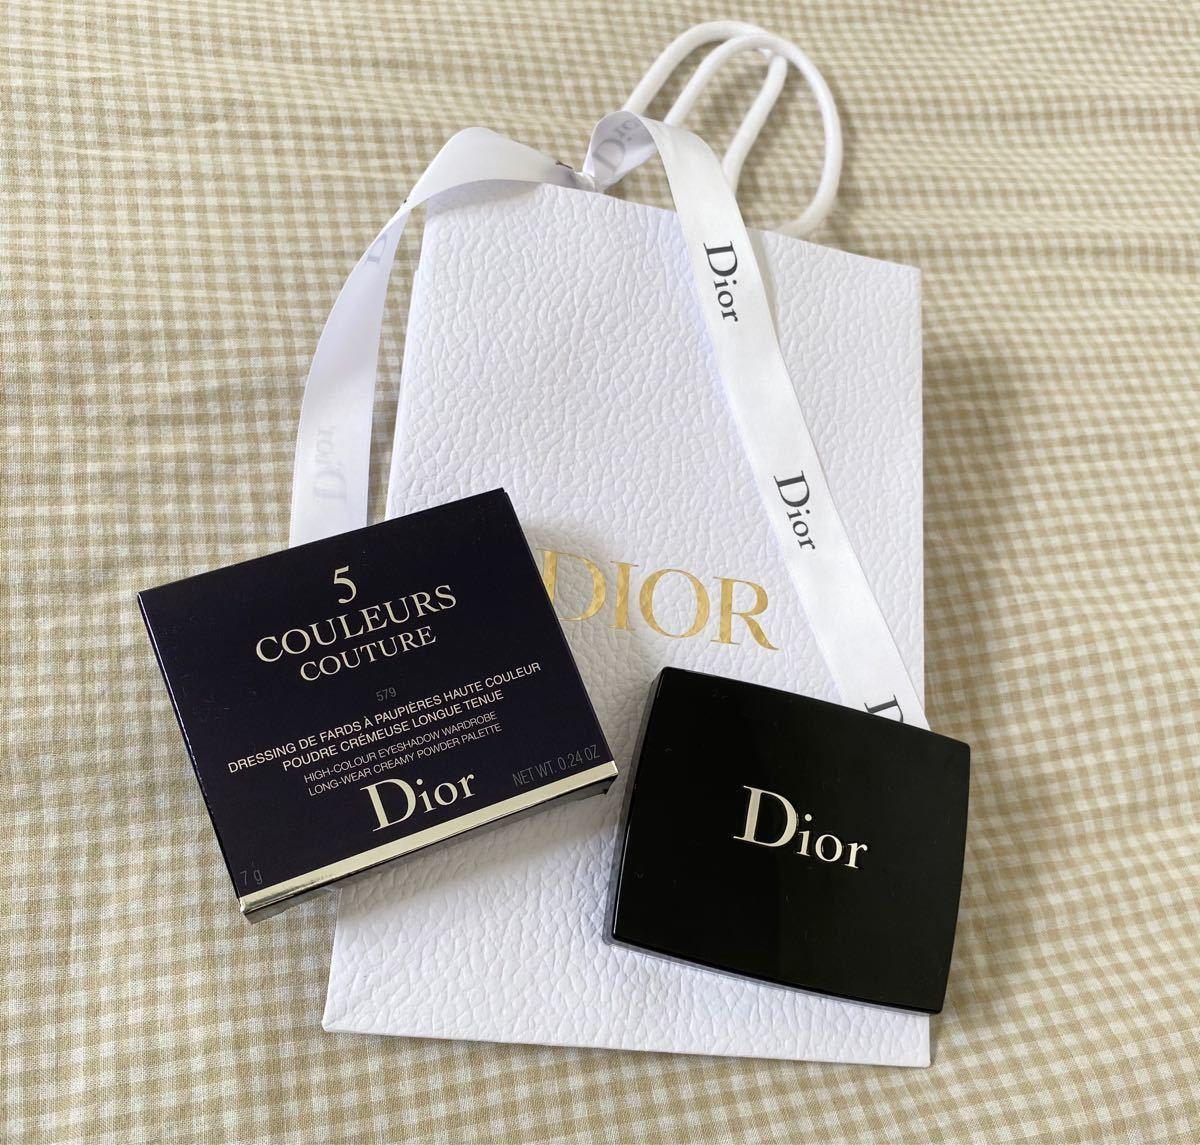 Christian Dior アイシャドウ サンク クルール クチュール (579 ジャングル)